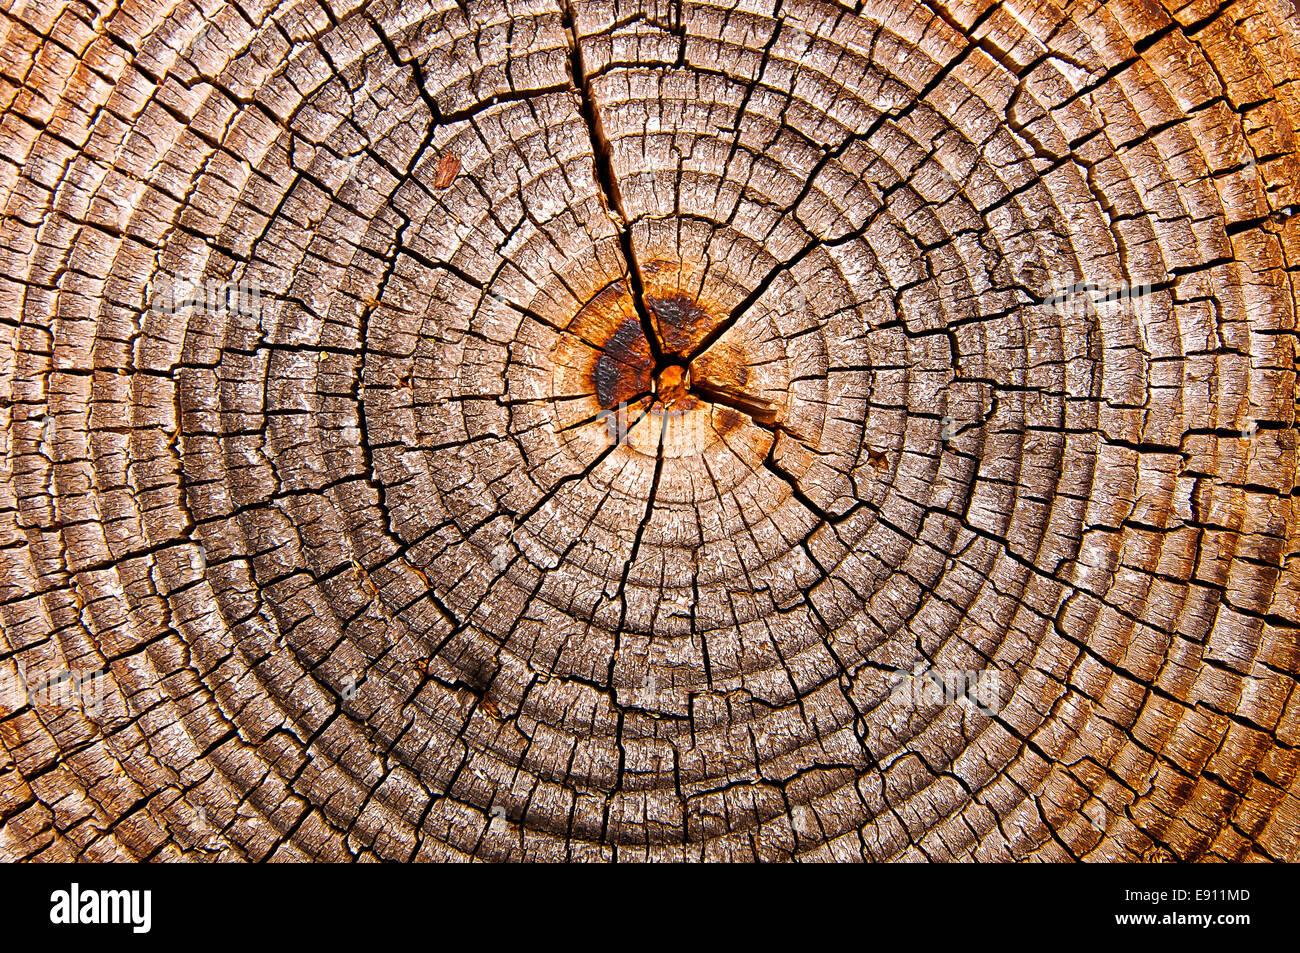 Tree grate - Stock Image